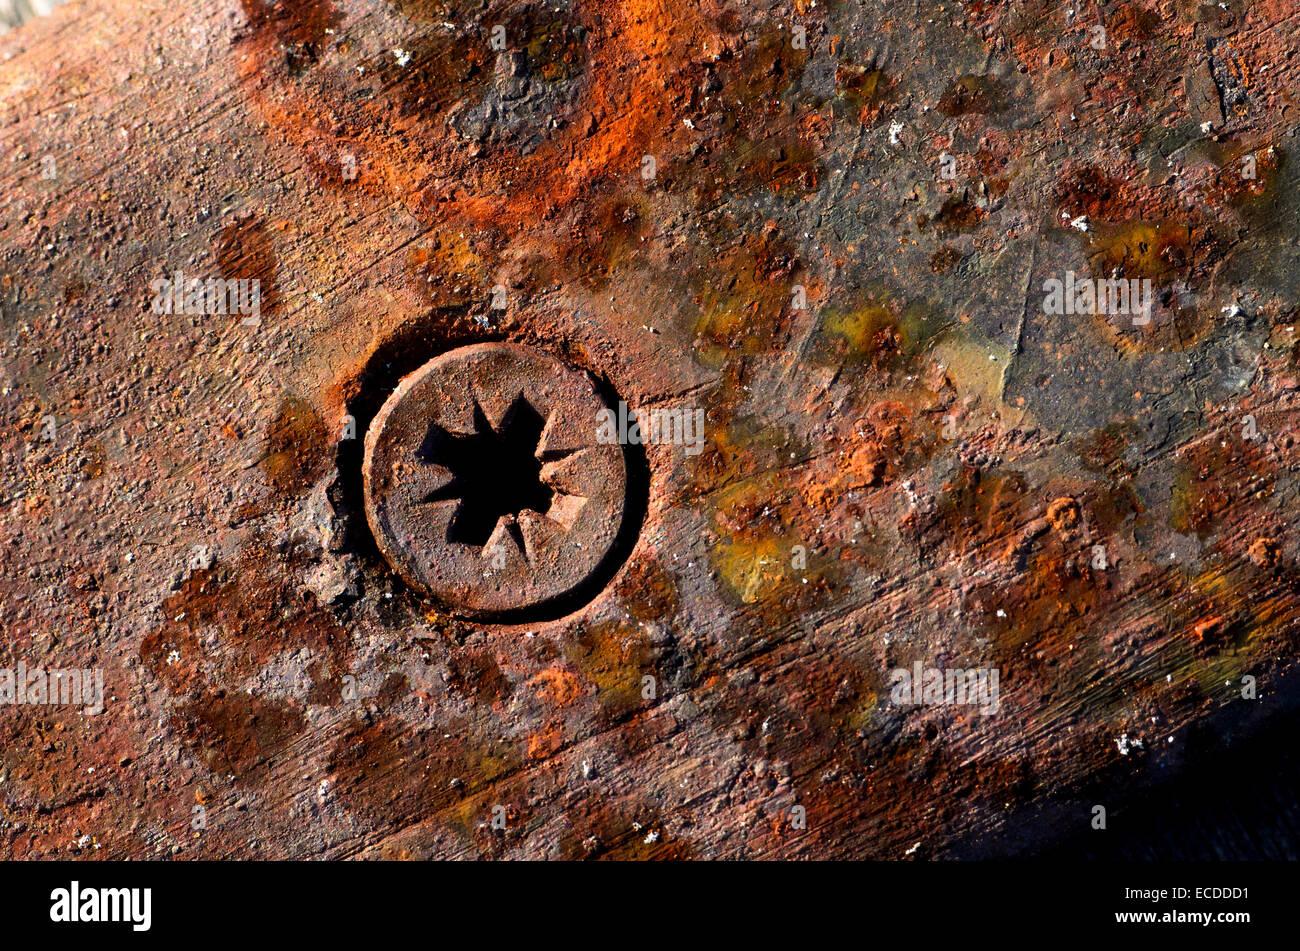 Metal plate bolt stockfotos metal plate bolt bilder alamy for Blumenkubel rostigem metall